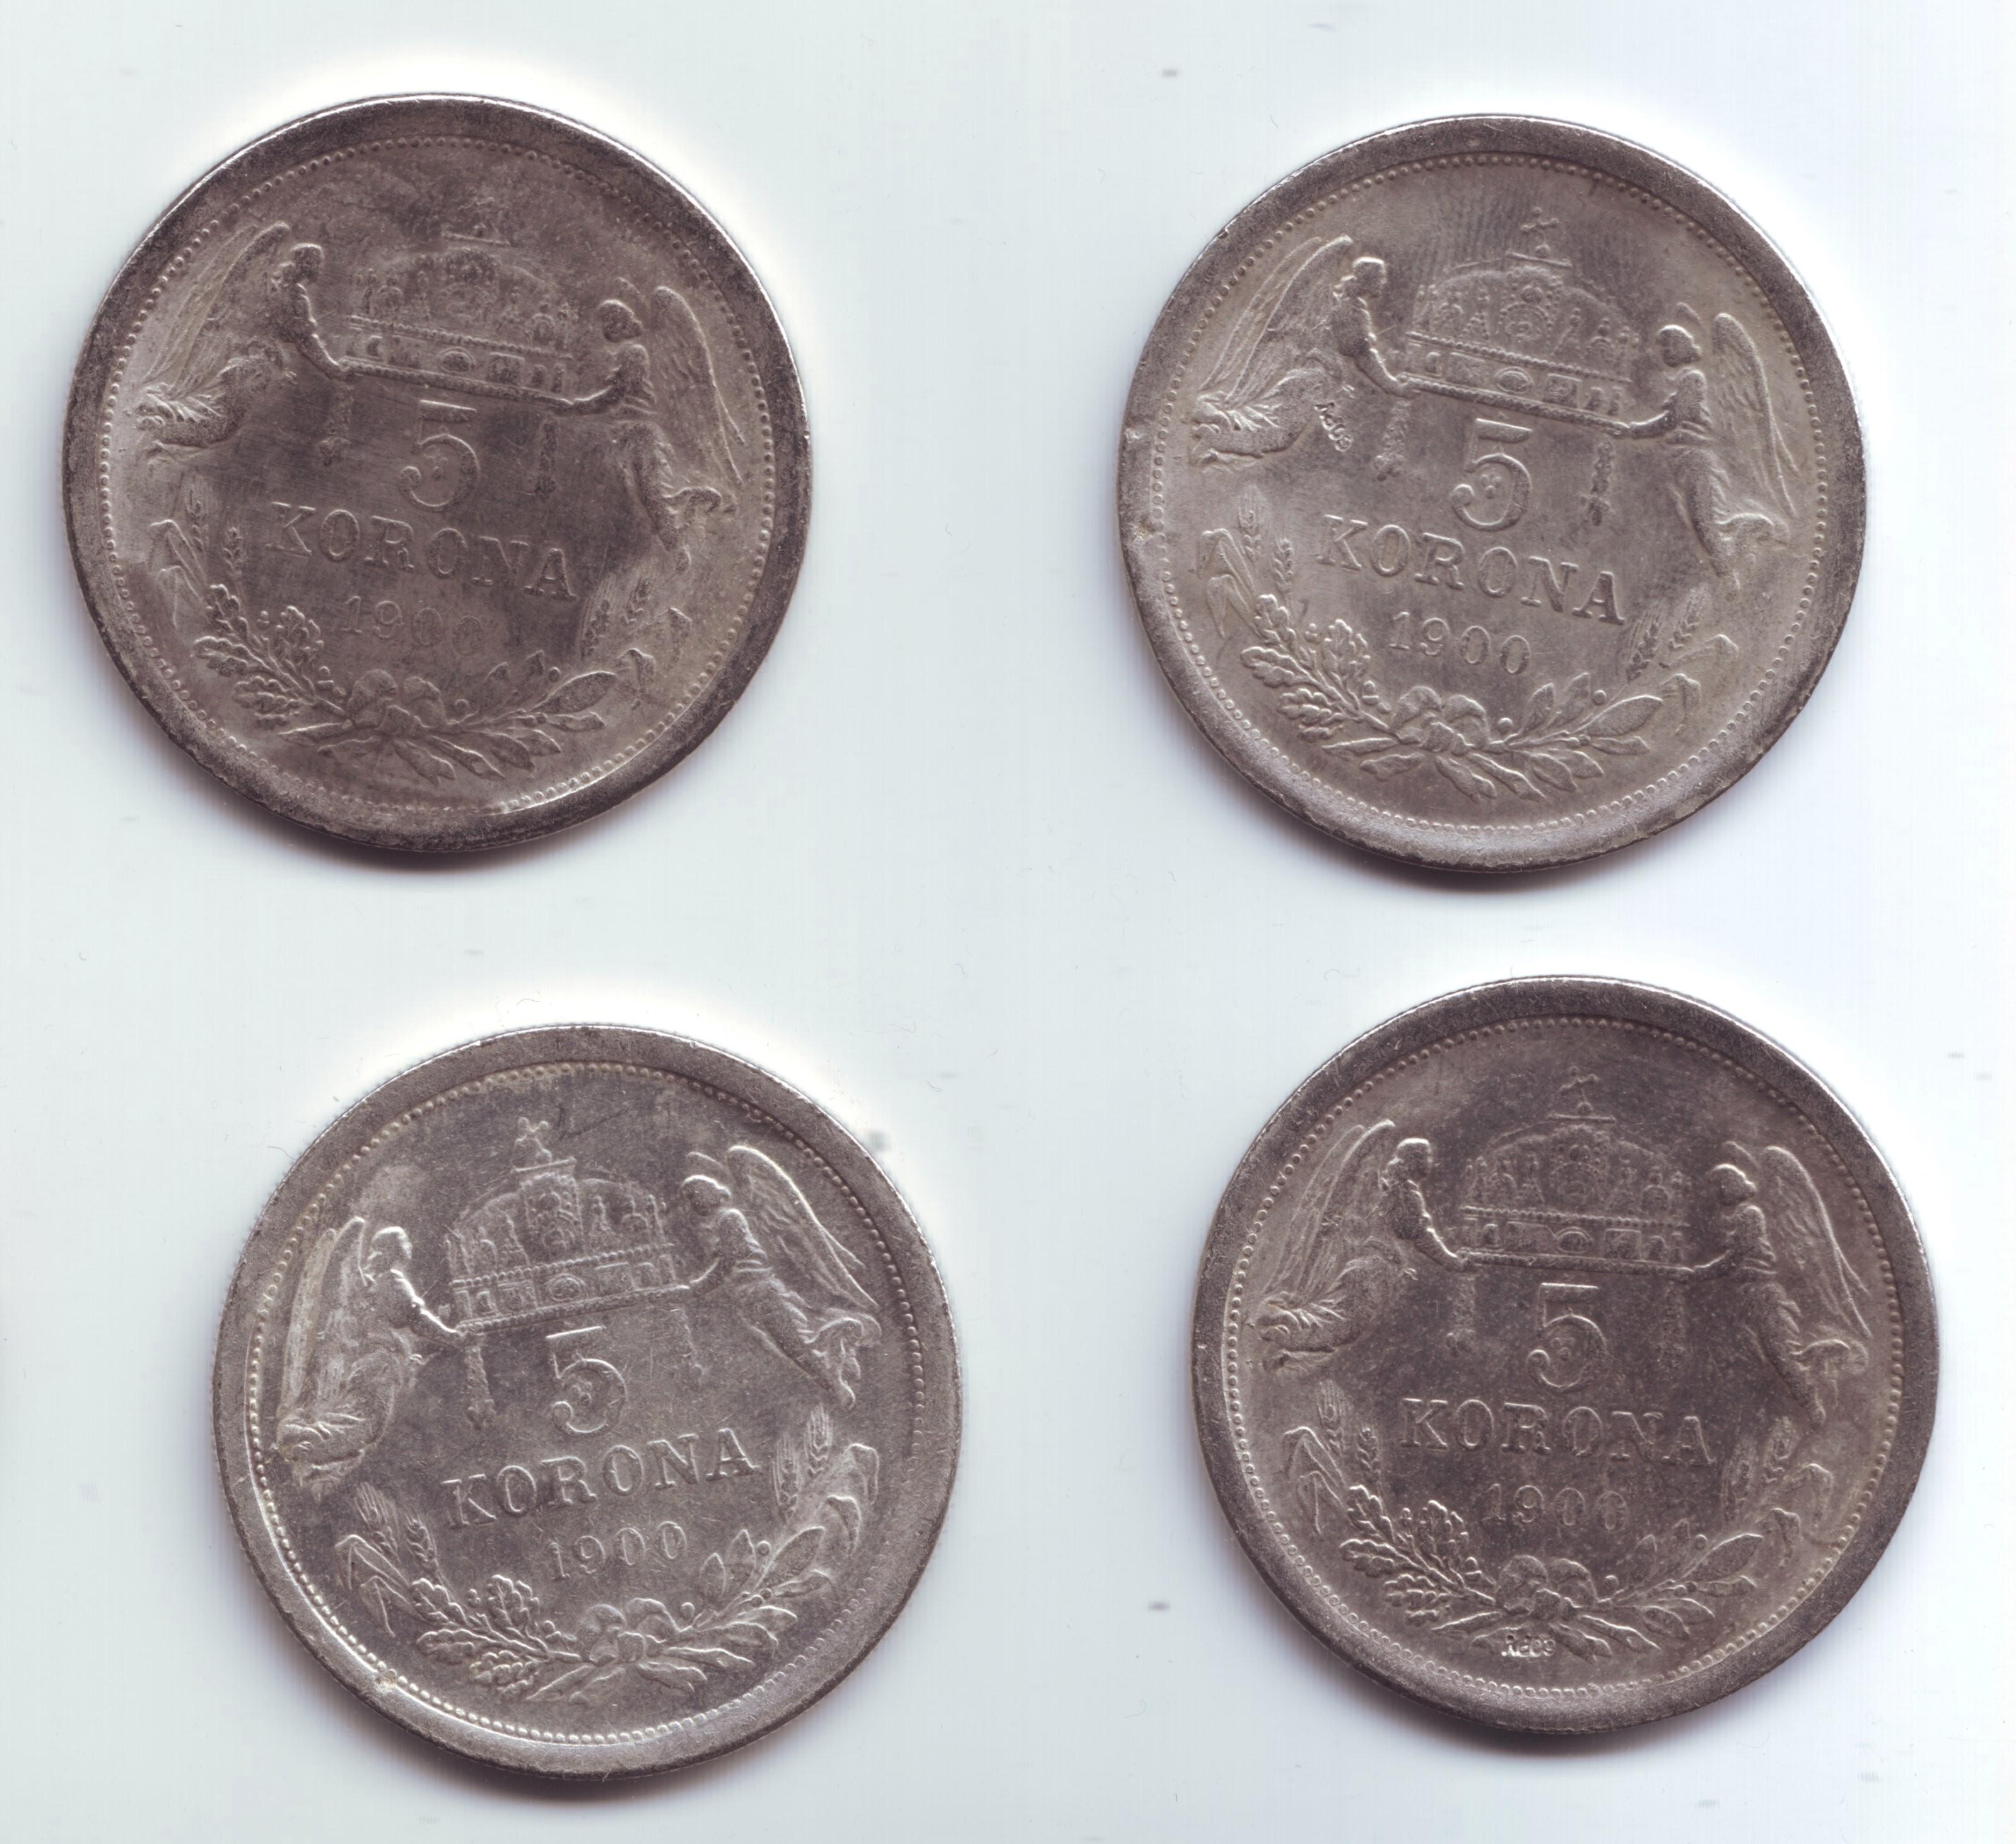 http://www.koronaportal.hu/hirek/1900-as-5-korona-reces-peremu-vas-masolata-kinabol-copy-replika-hamis/1900-as-5-korona-reces-peremu-vas-masolata-kinabol-copy-replika-hamis_03.jpg